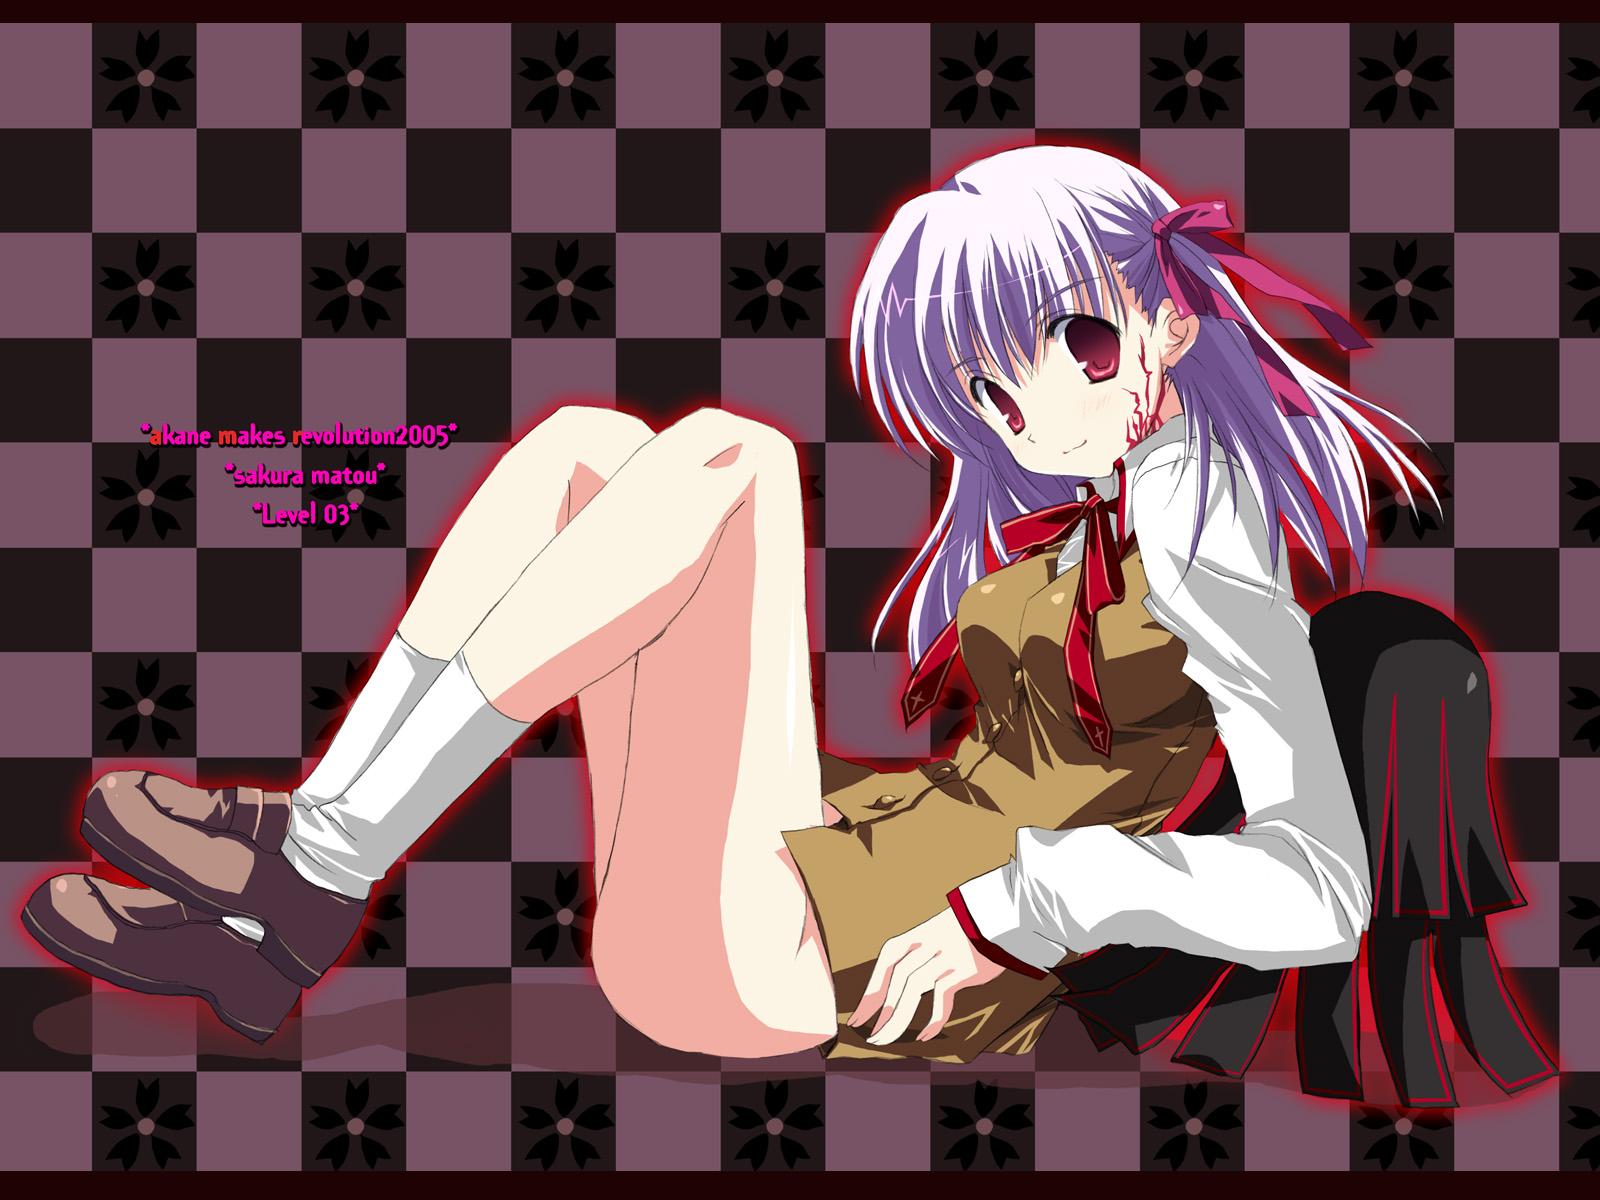 dark_matou_sakura fate_(series) fate/stay_night ikegami_akane matou_sakura nopan